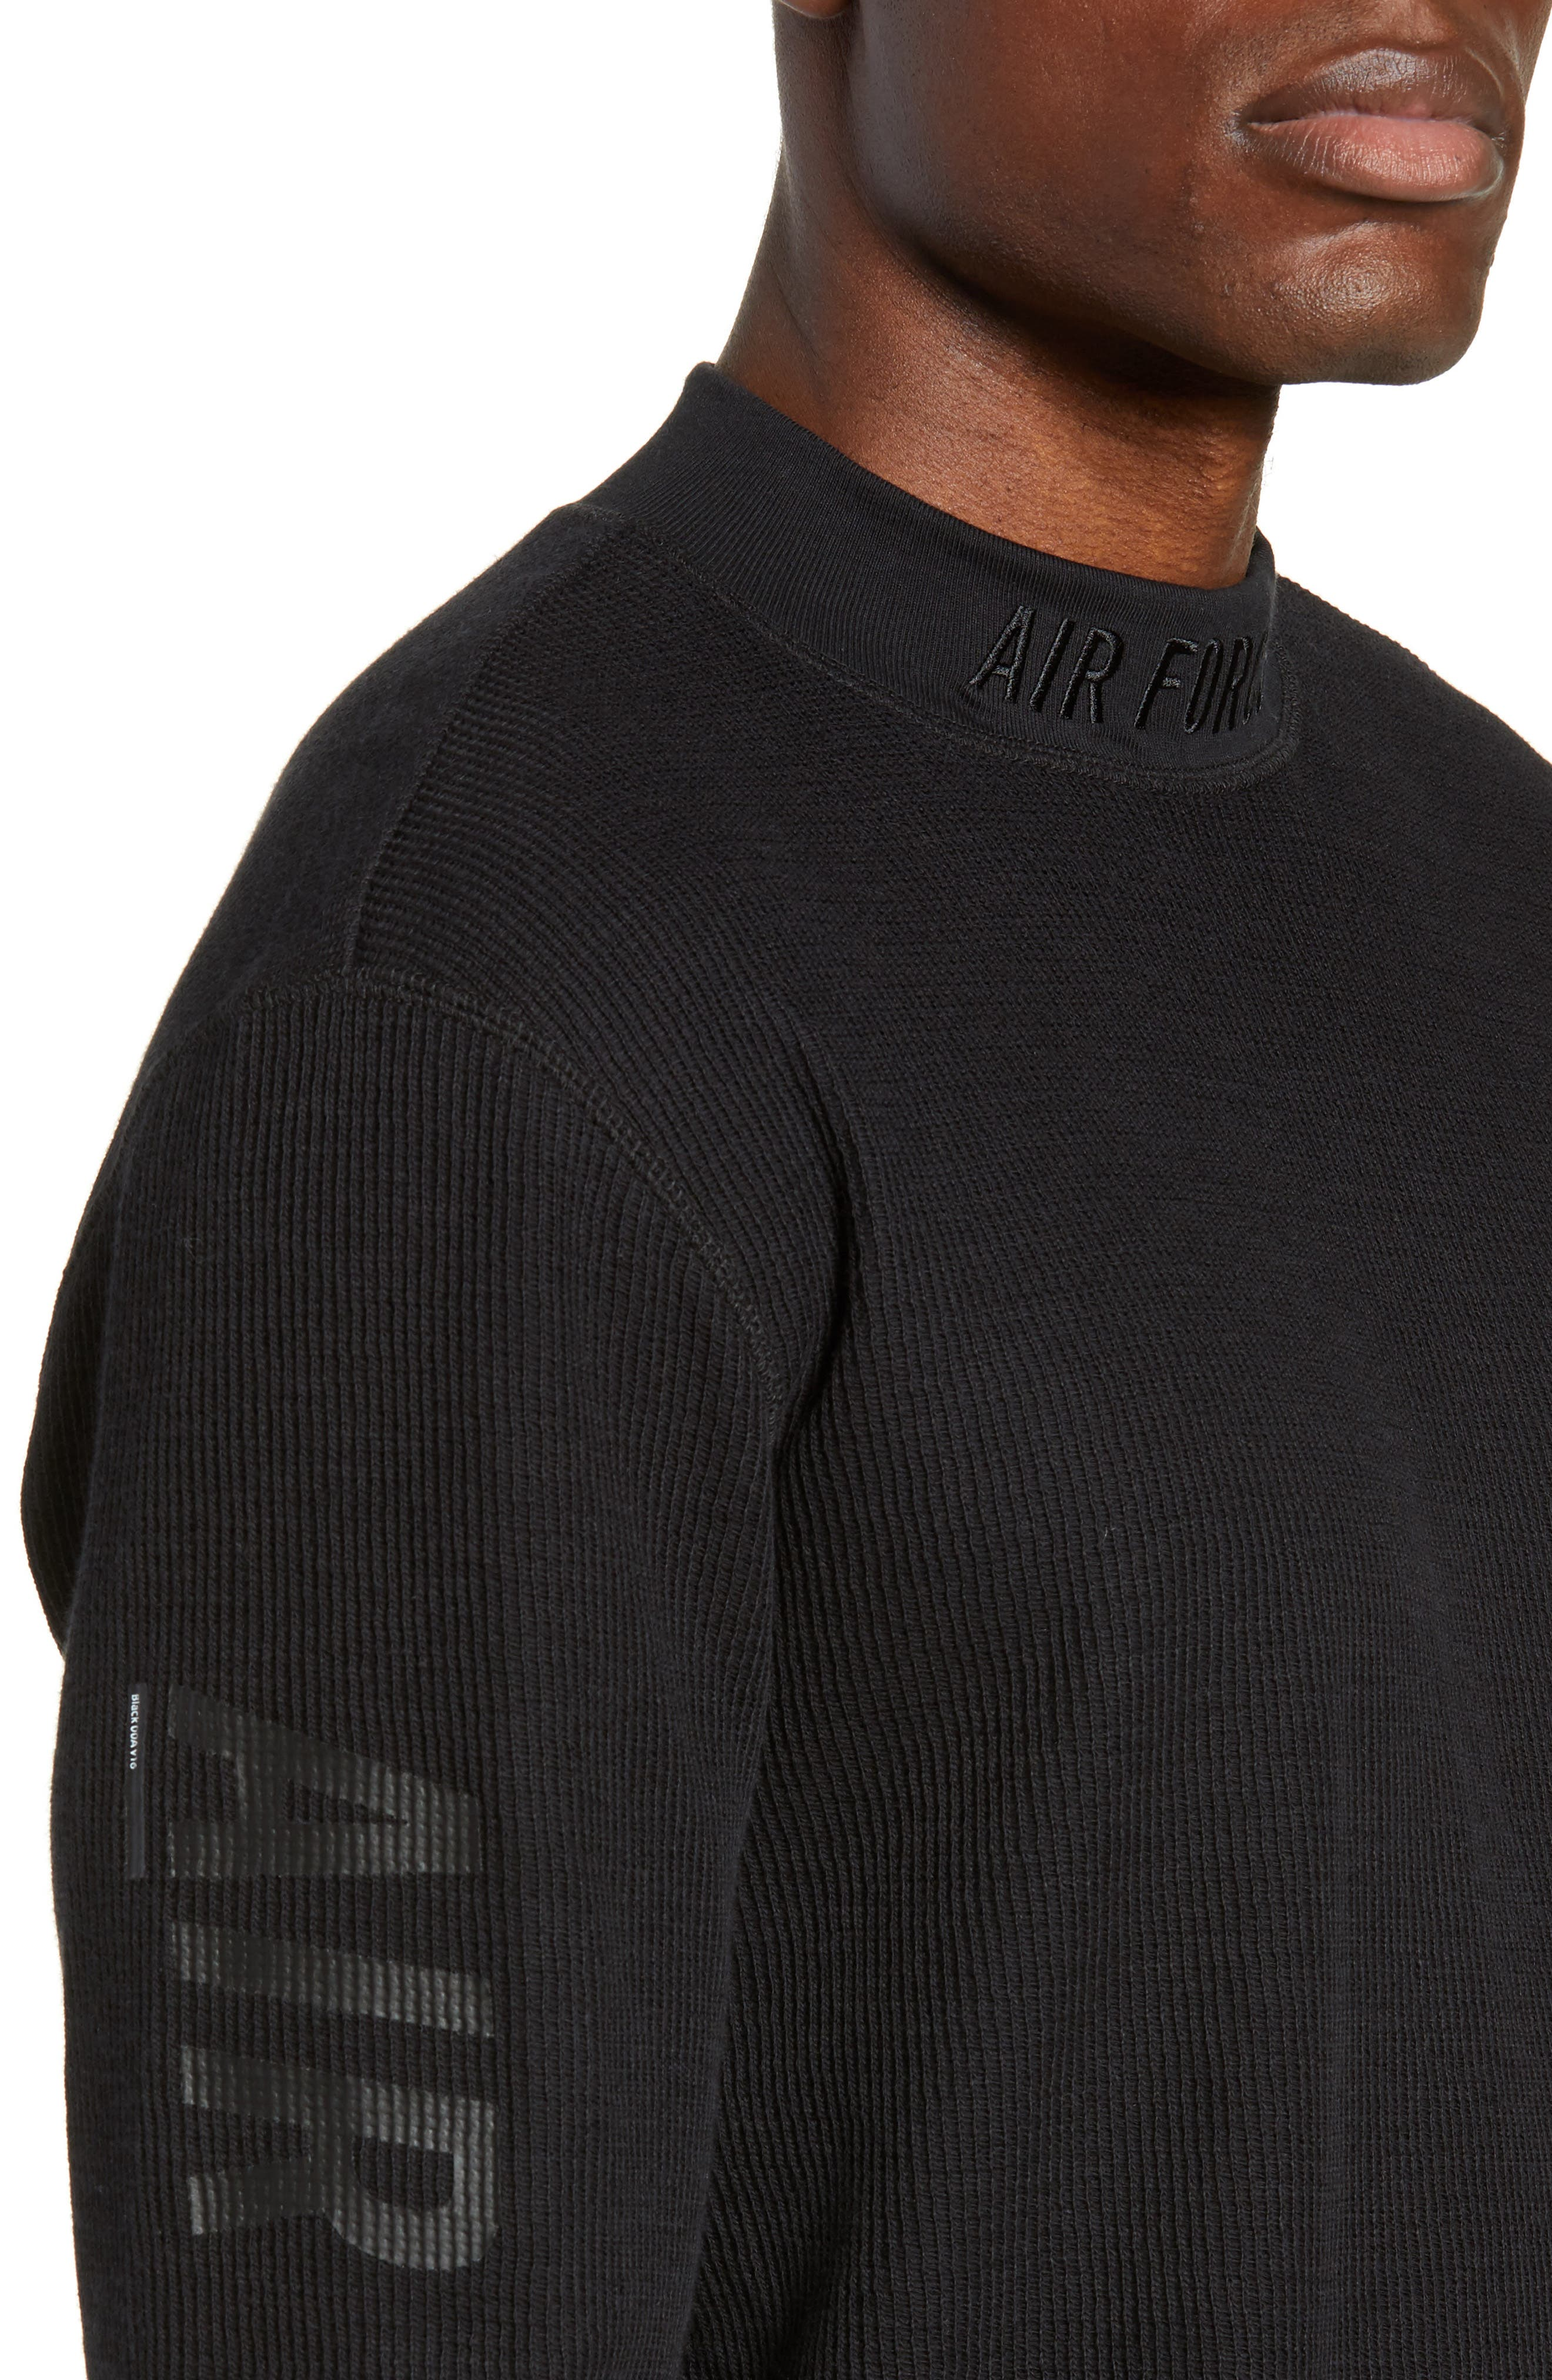 Sportswear Air Force 1 Long Sleeve Top,                             Alternate thumbnail 4, color,                             BLACK